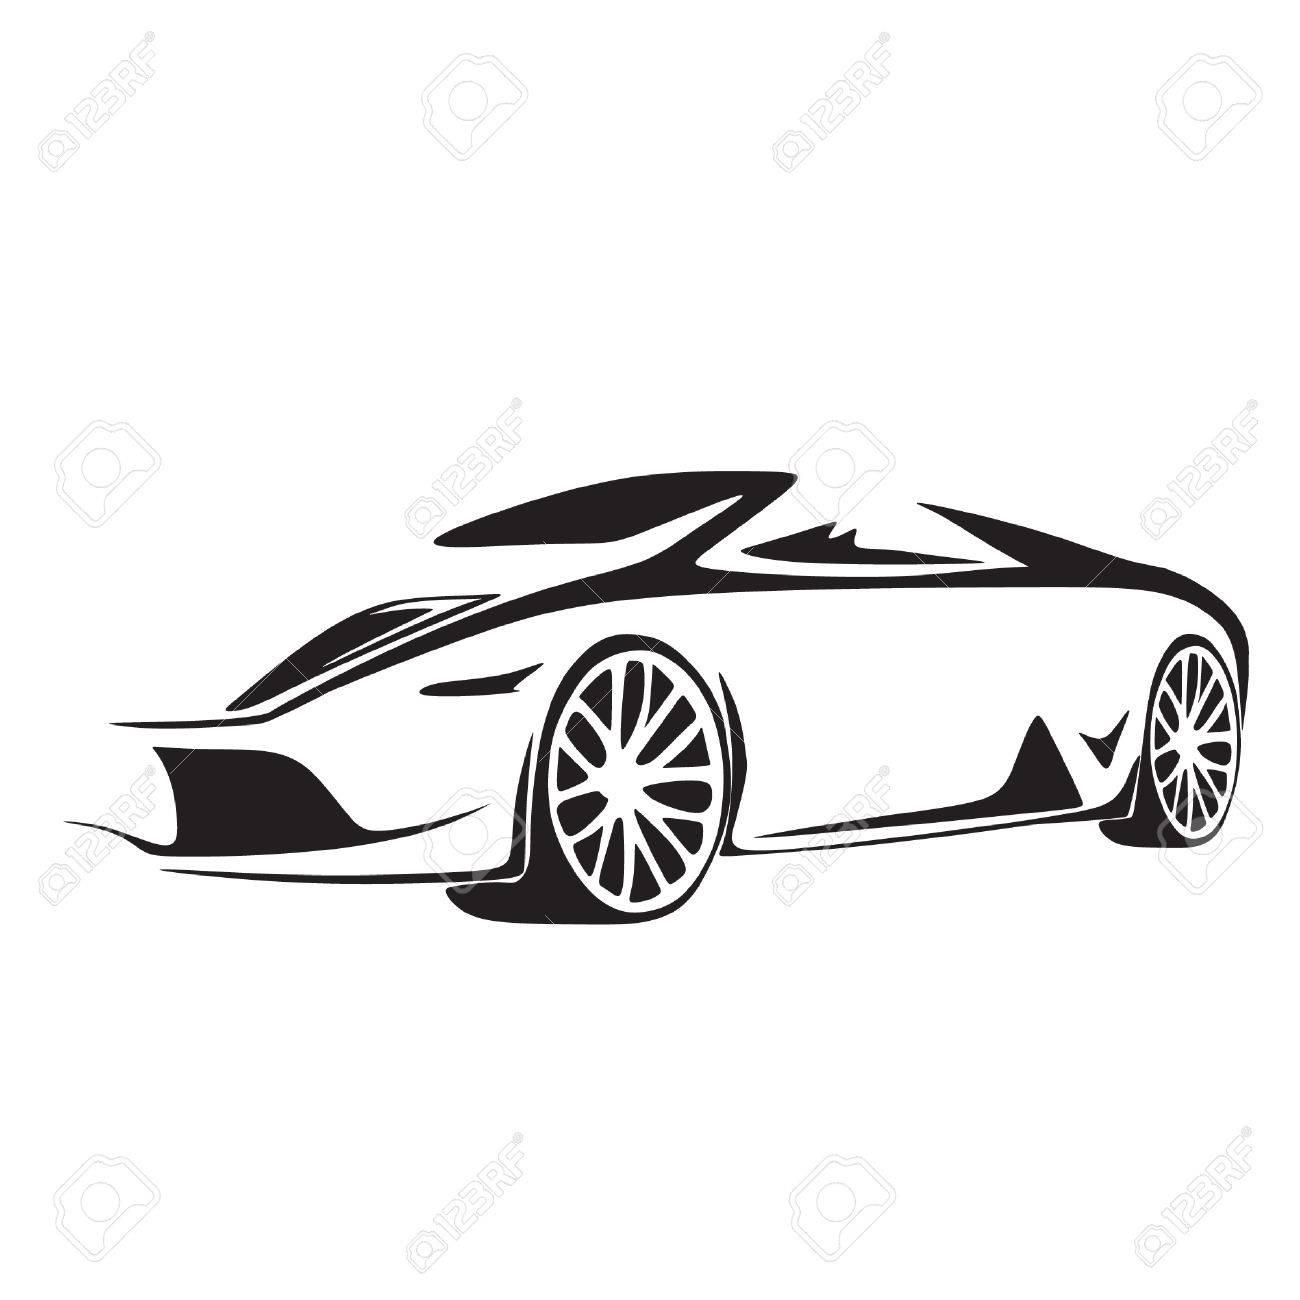 Sport Car Vector Royalty Free Cliparts Vectors And Stock